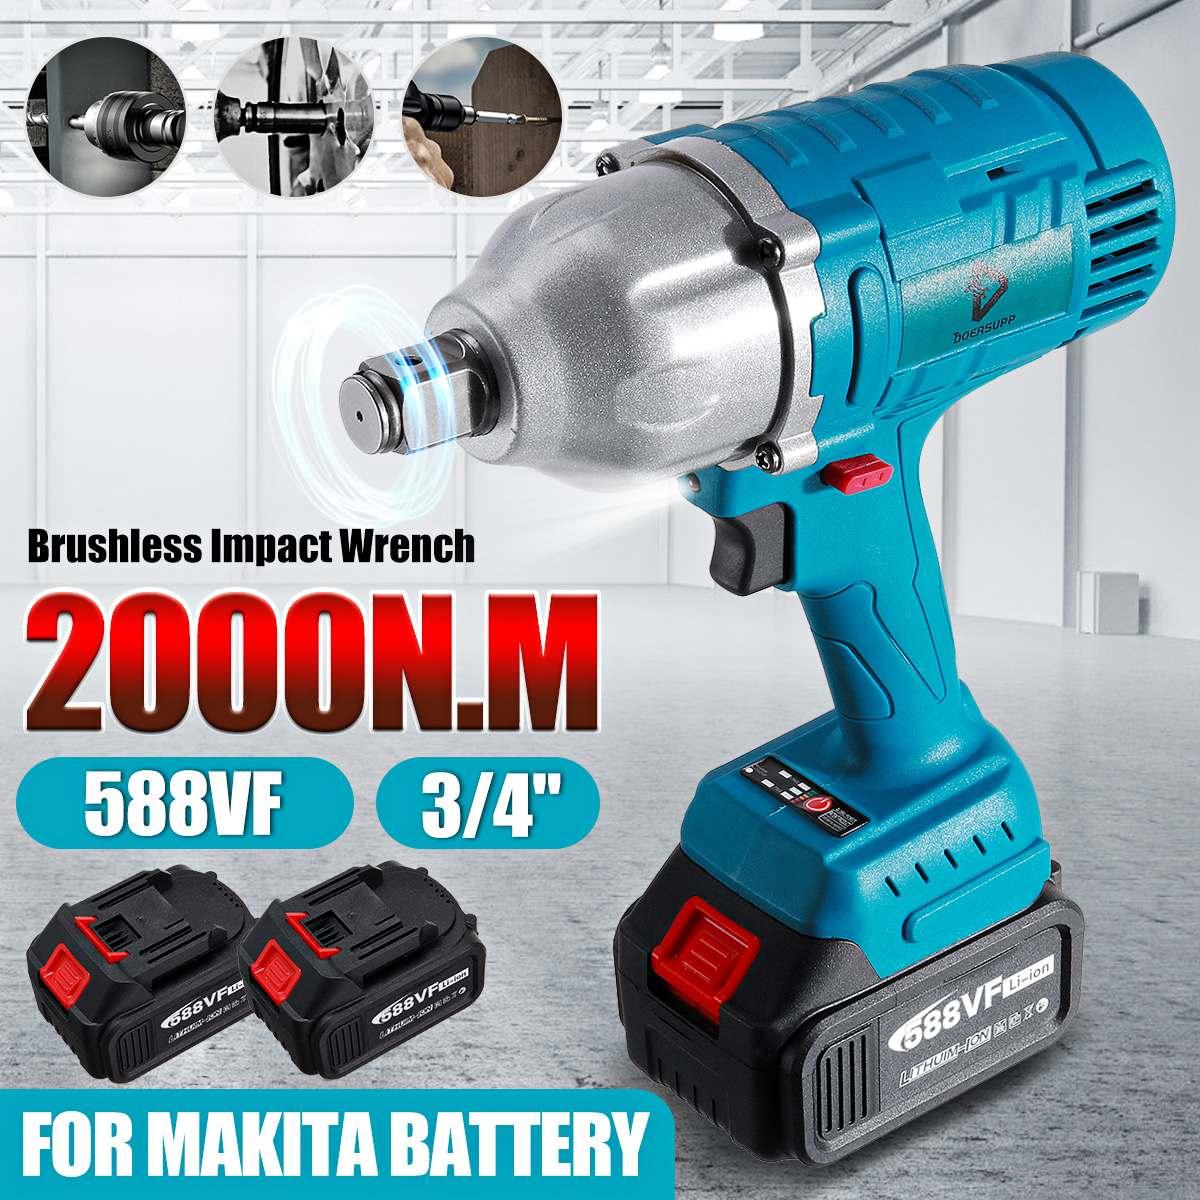 REAL 2000N.M لاسلكي مفتاح برغي كهربائي 3/4 بوصة مقبس أدوات كهربائية 588Vf بطارية ليثيوم + مصباح ليد مناسب مع بطارية ماكيتا 18 فولت